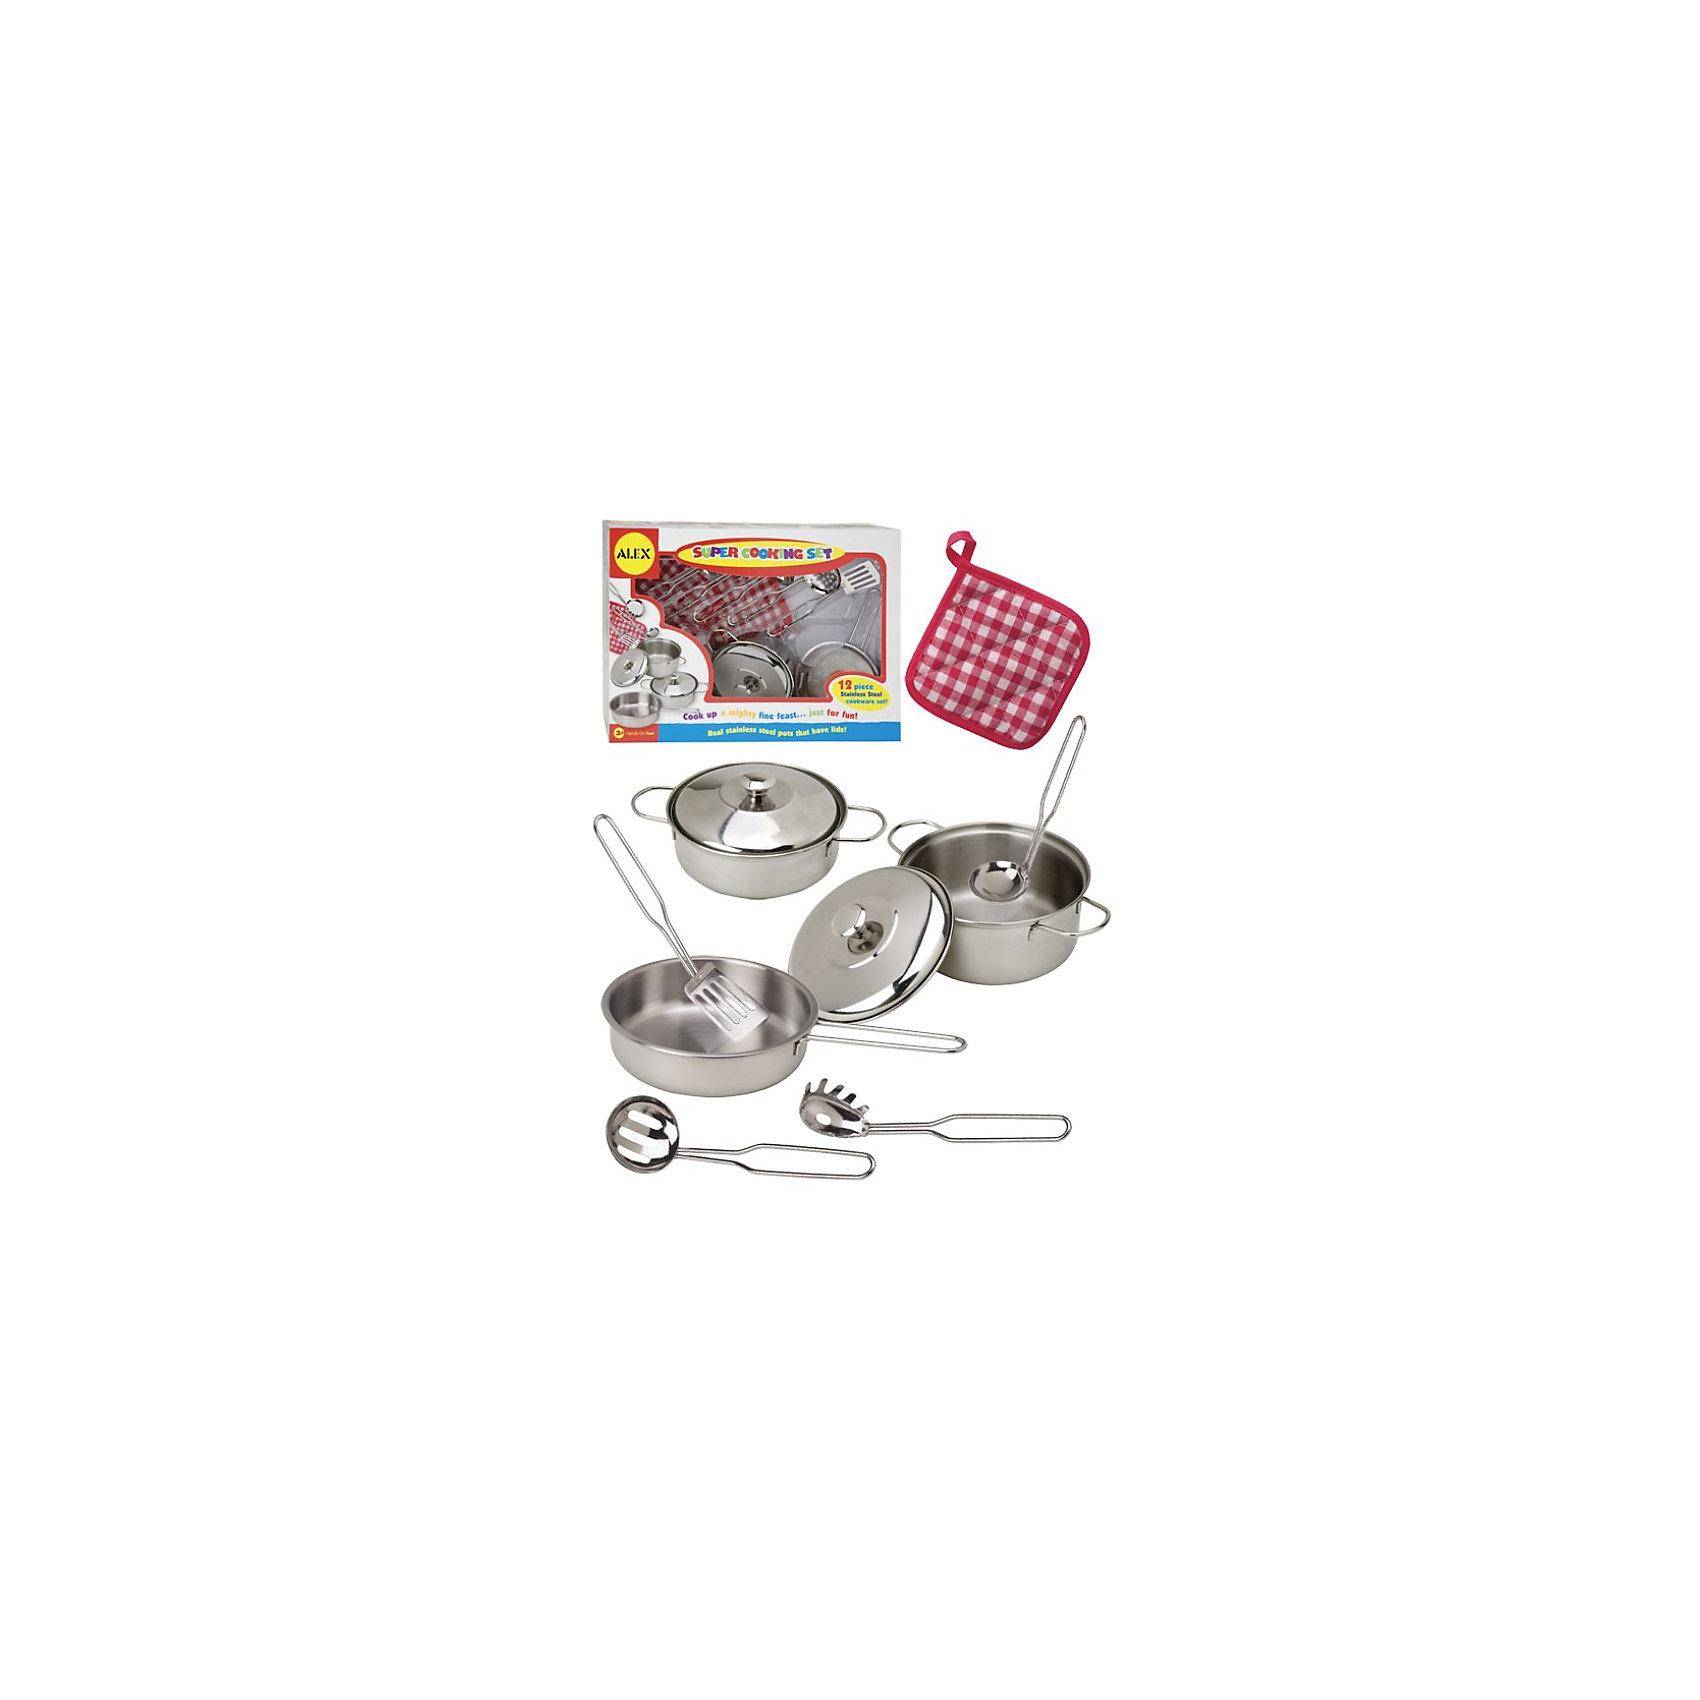 ALEX ALEX 603N Набор нержавеющей посуды